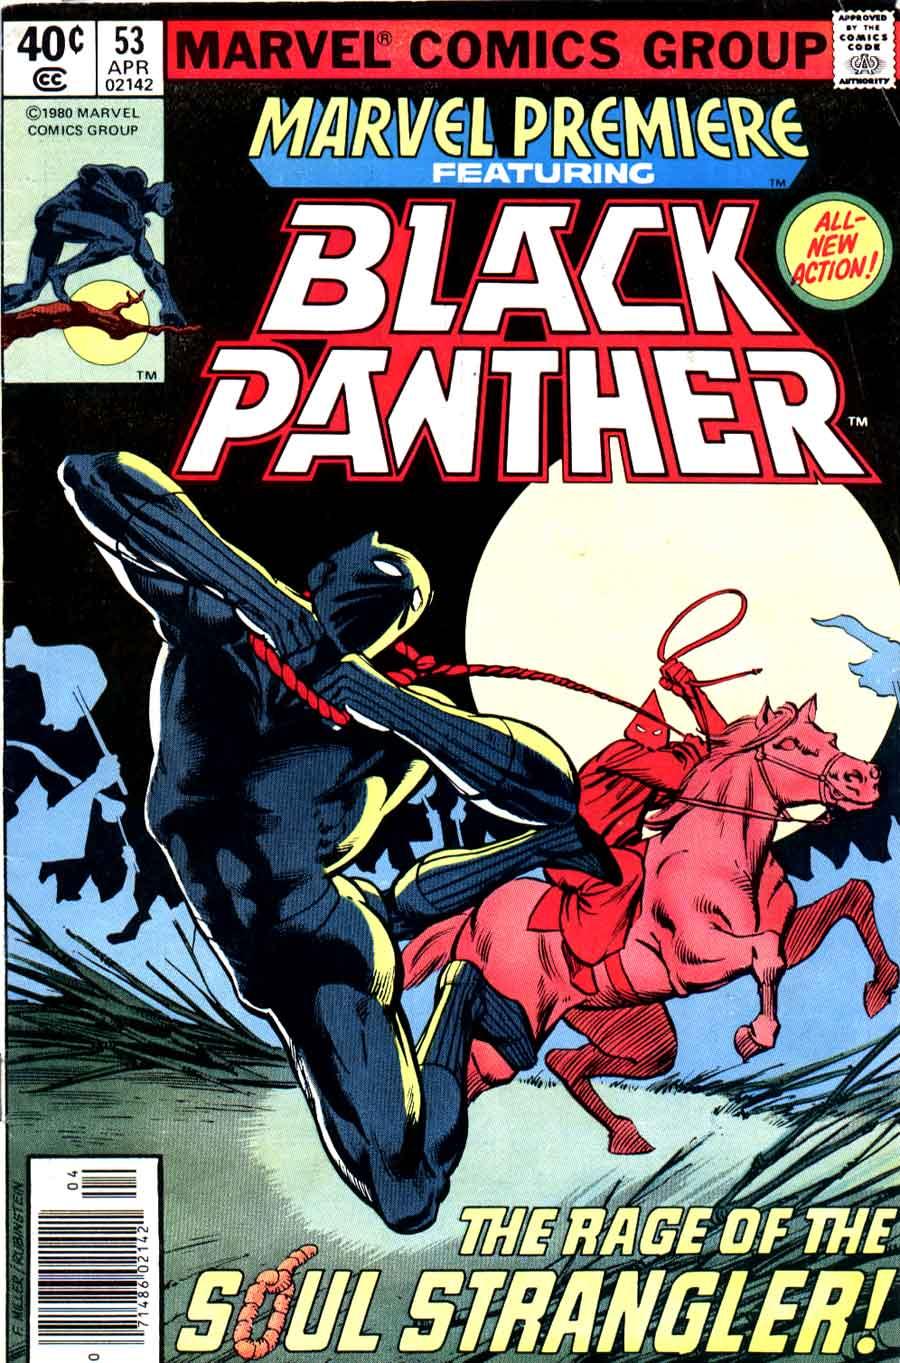 Marvel Premiere #53 / Black Panther 1970s bronze age marvel cover art by Frank Miller